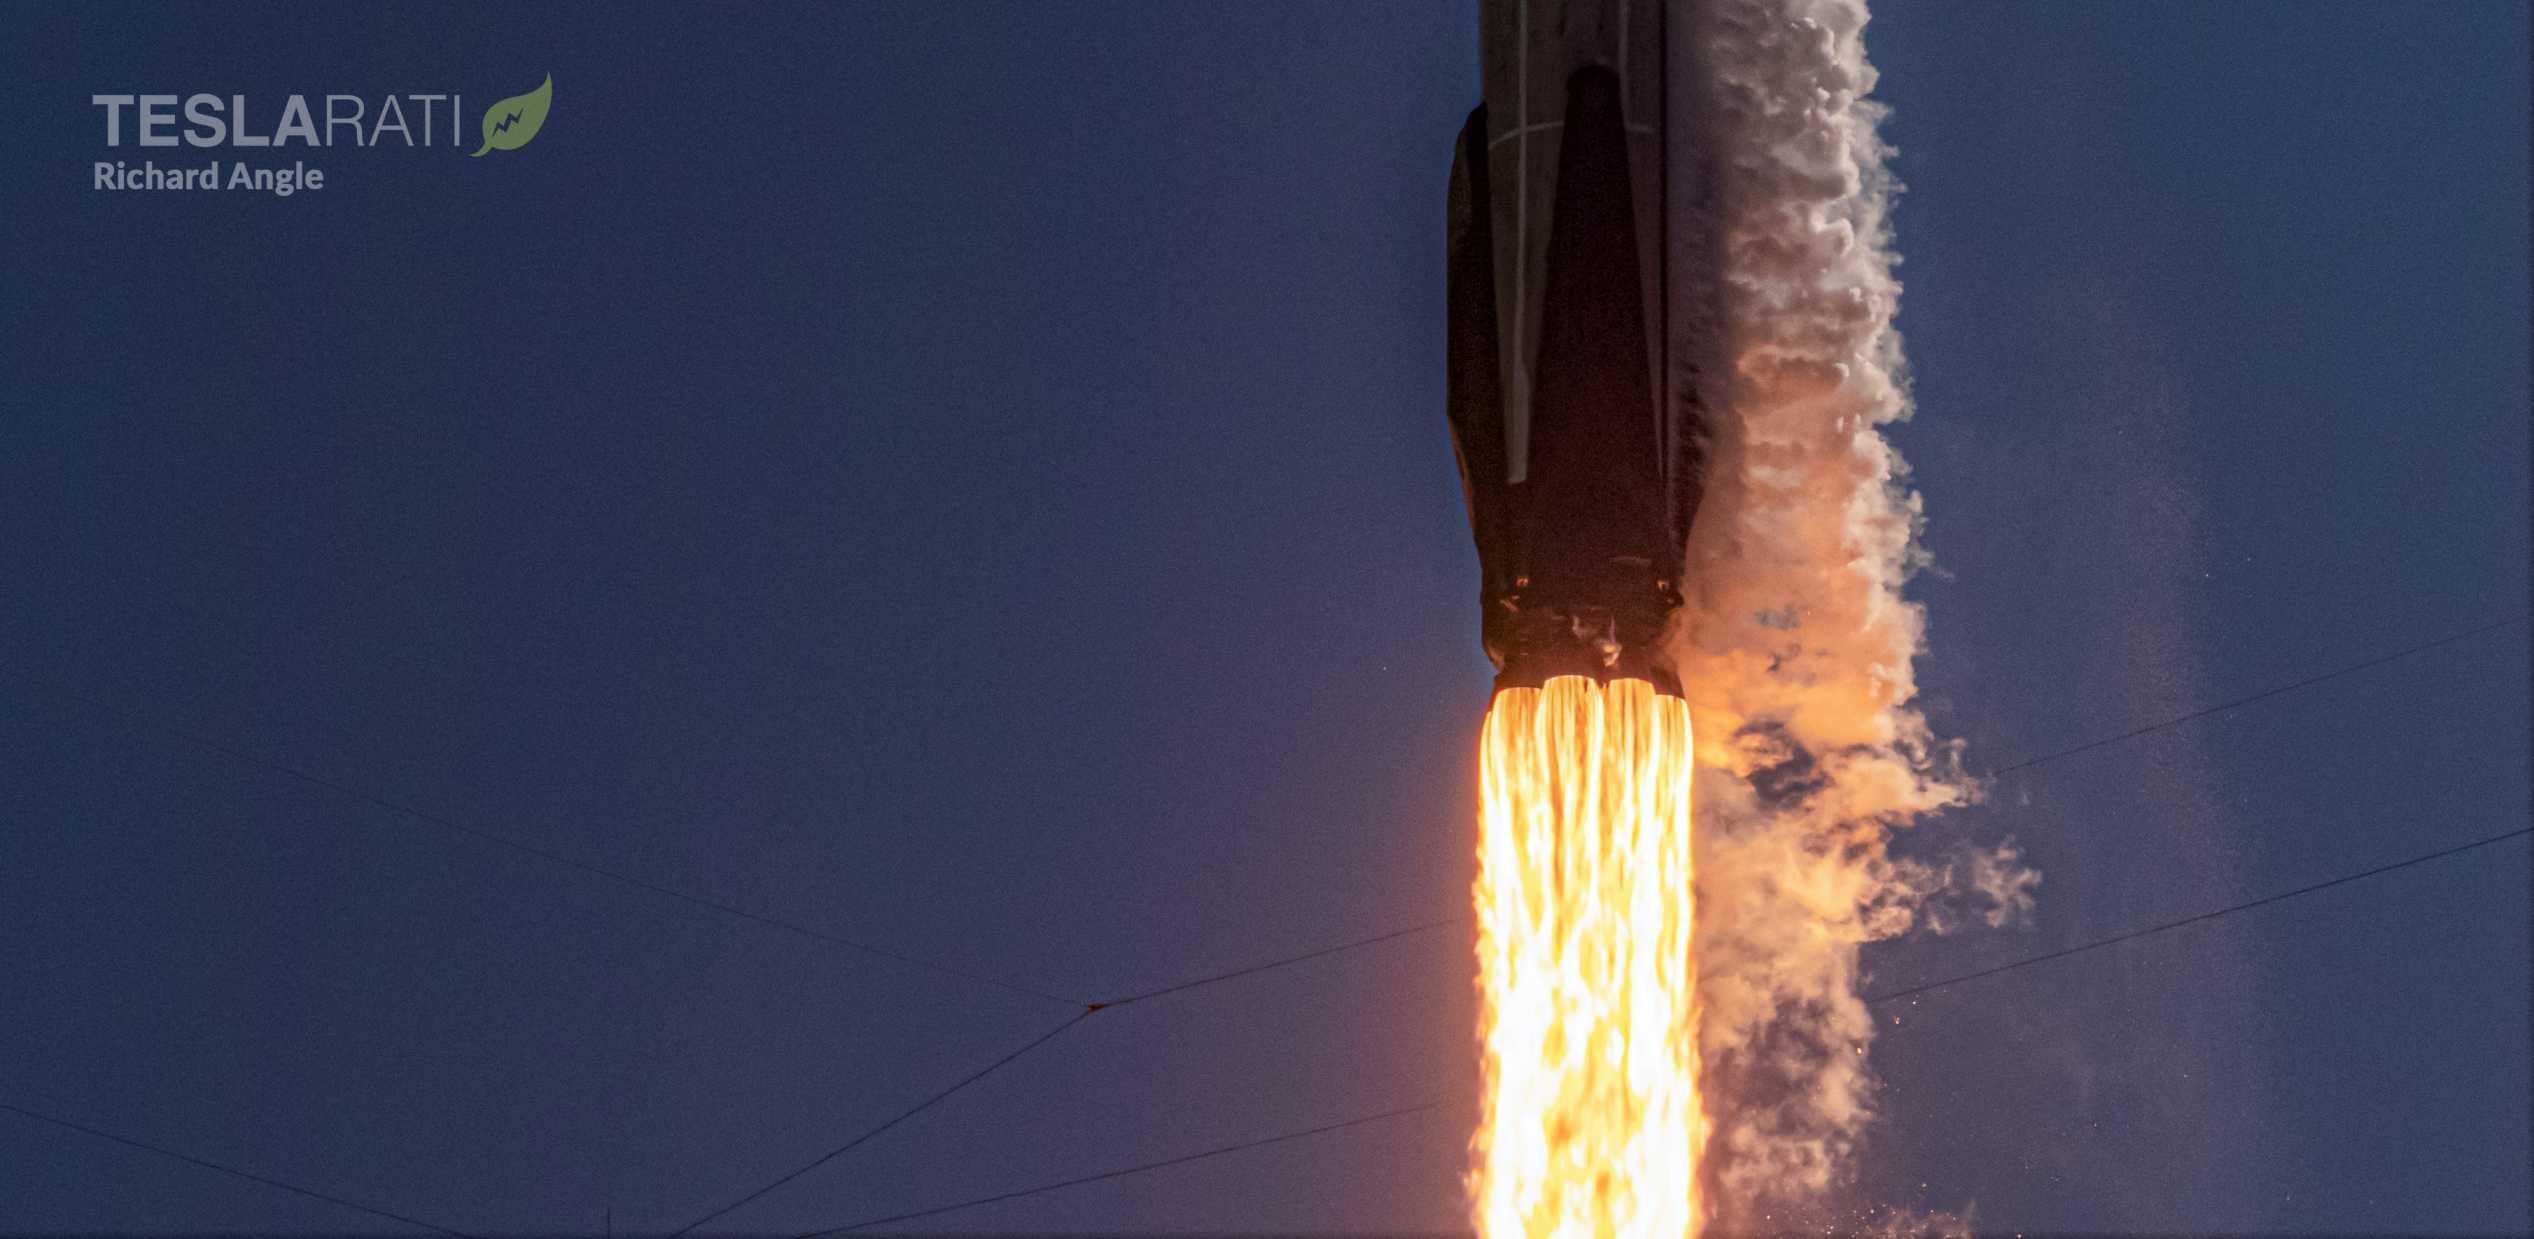 ANASIS II Falcon 9 B1058 072020 (Richard Angle) launch 5 crop 1 (c)